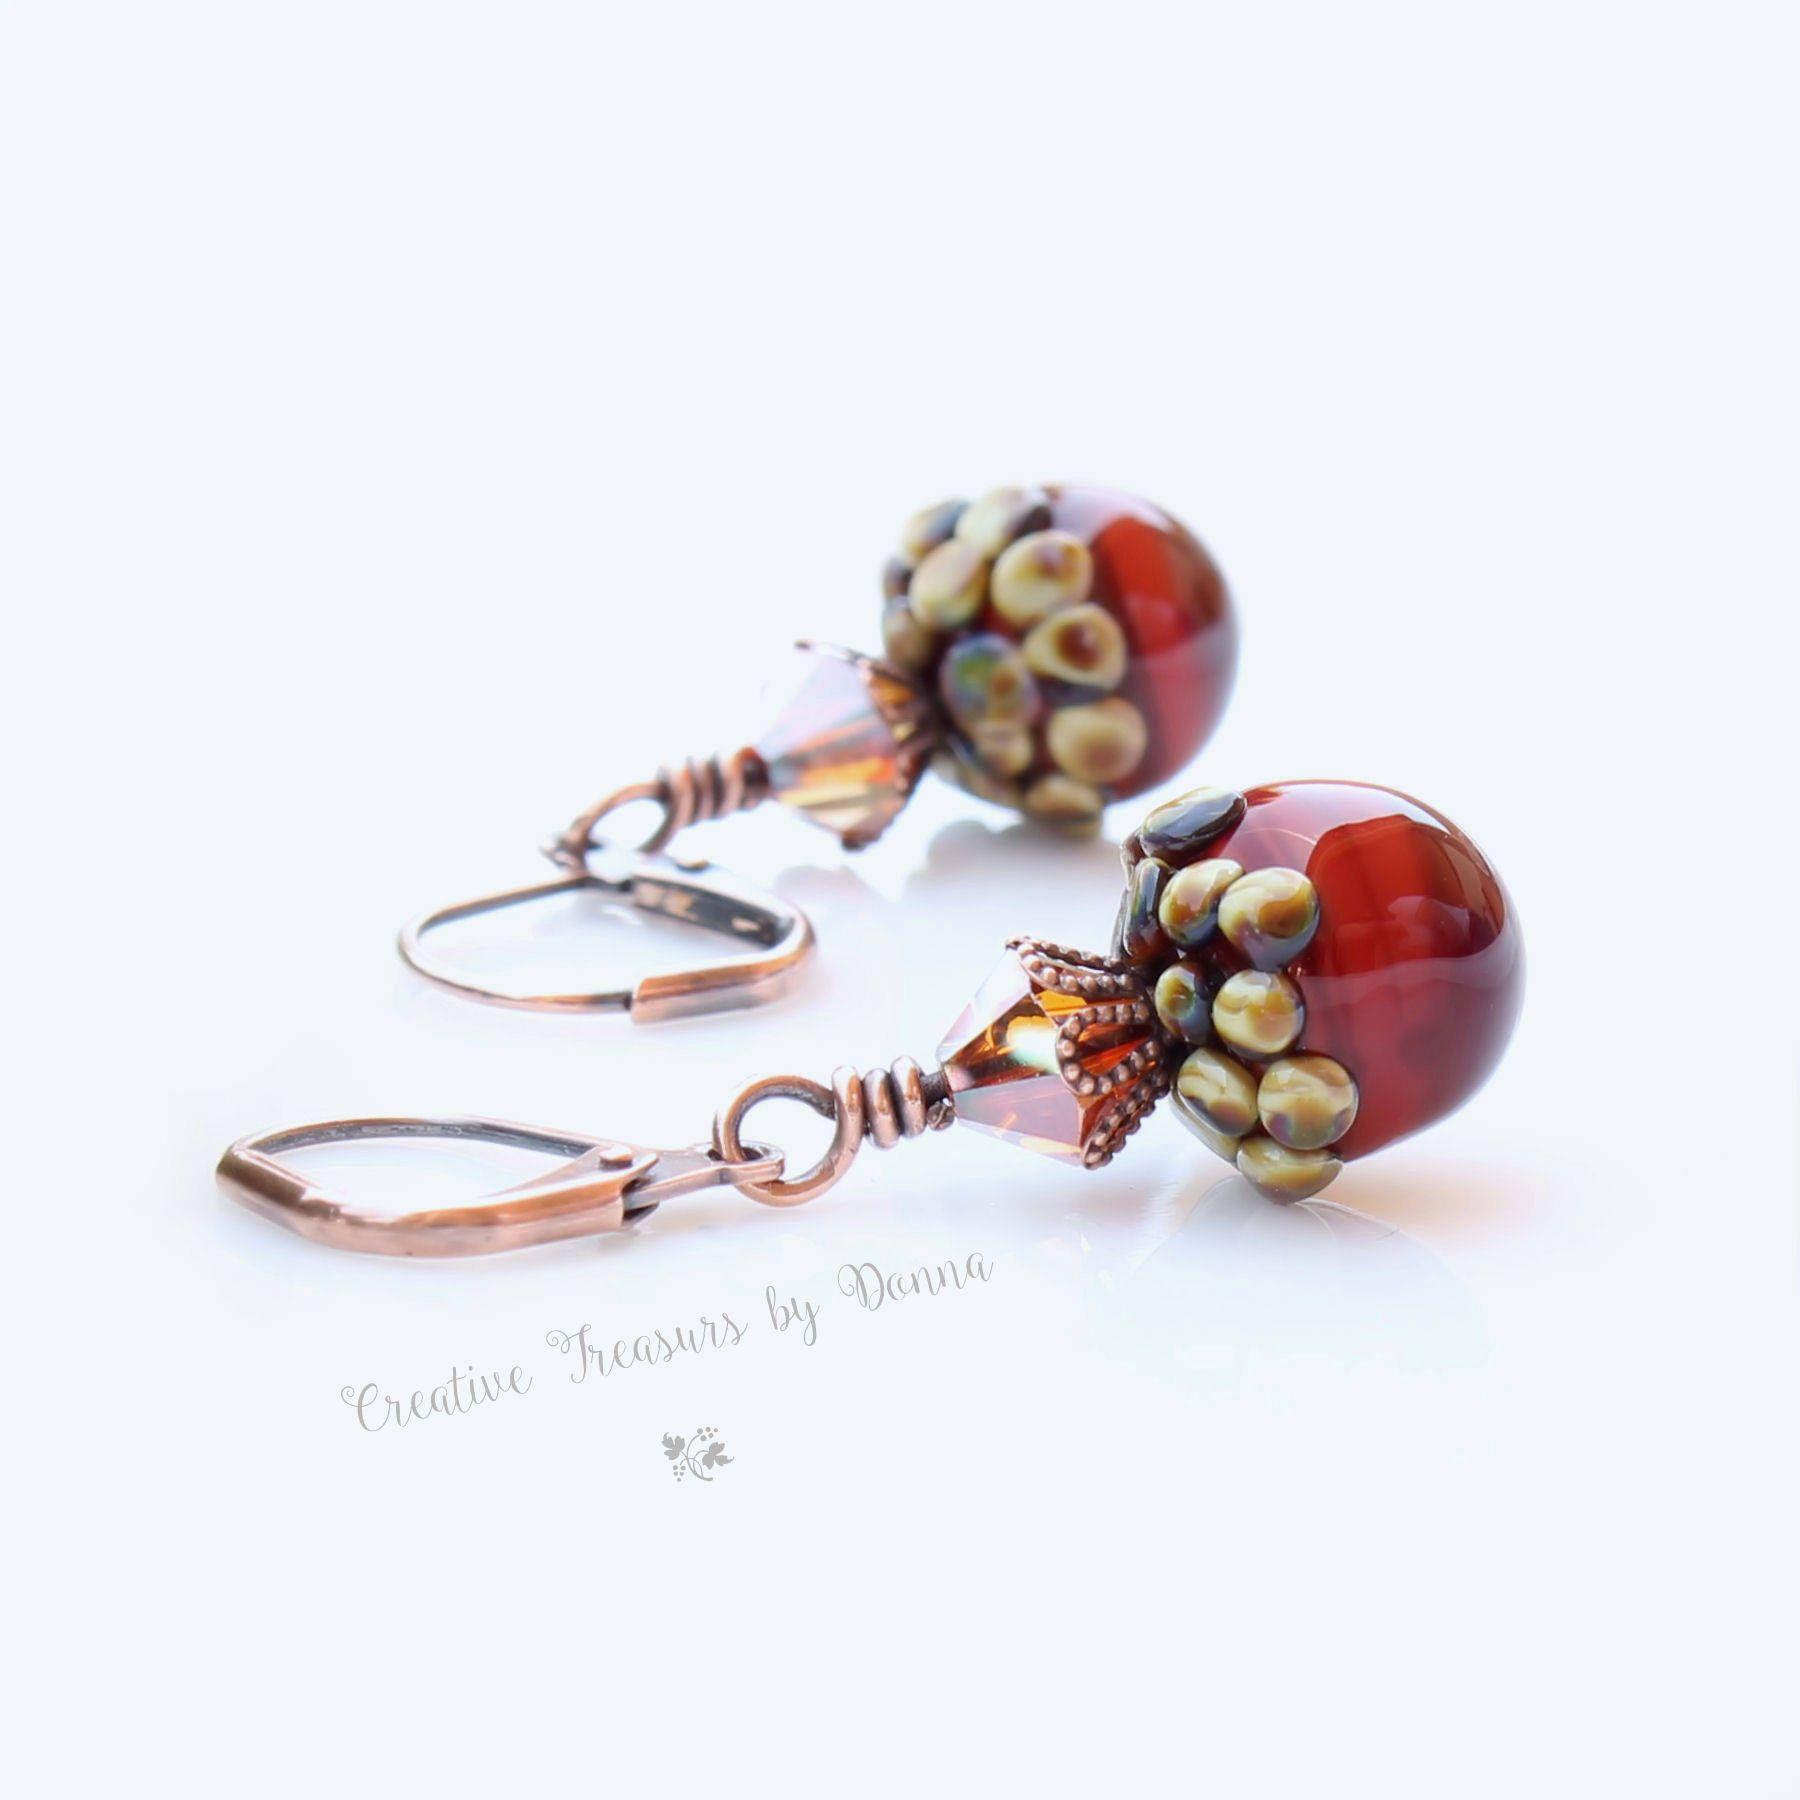 Acorn Copper Earrings Swarovski Crystals Lampwork Glass Acorns Fall Earrings Reddish Brown Fall Earrings by Ctbydonna on Etsy